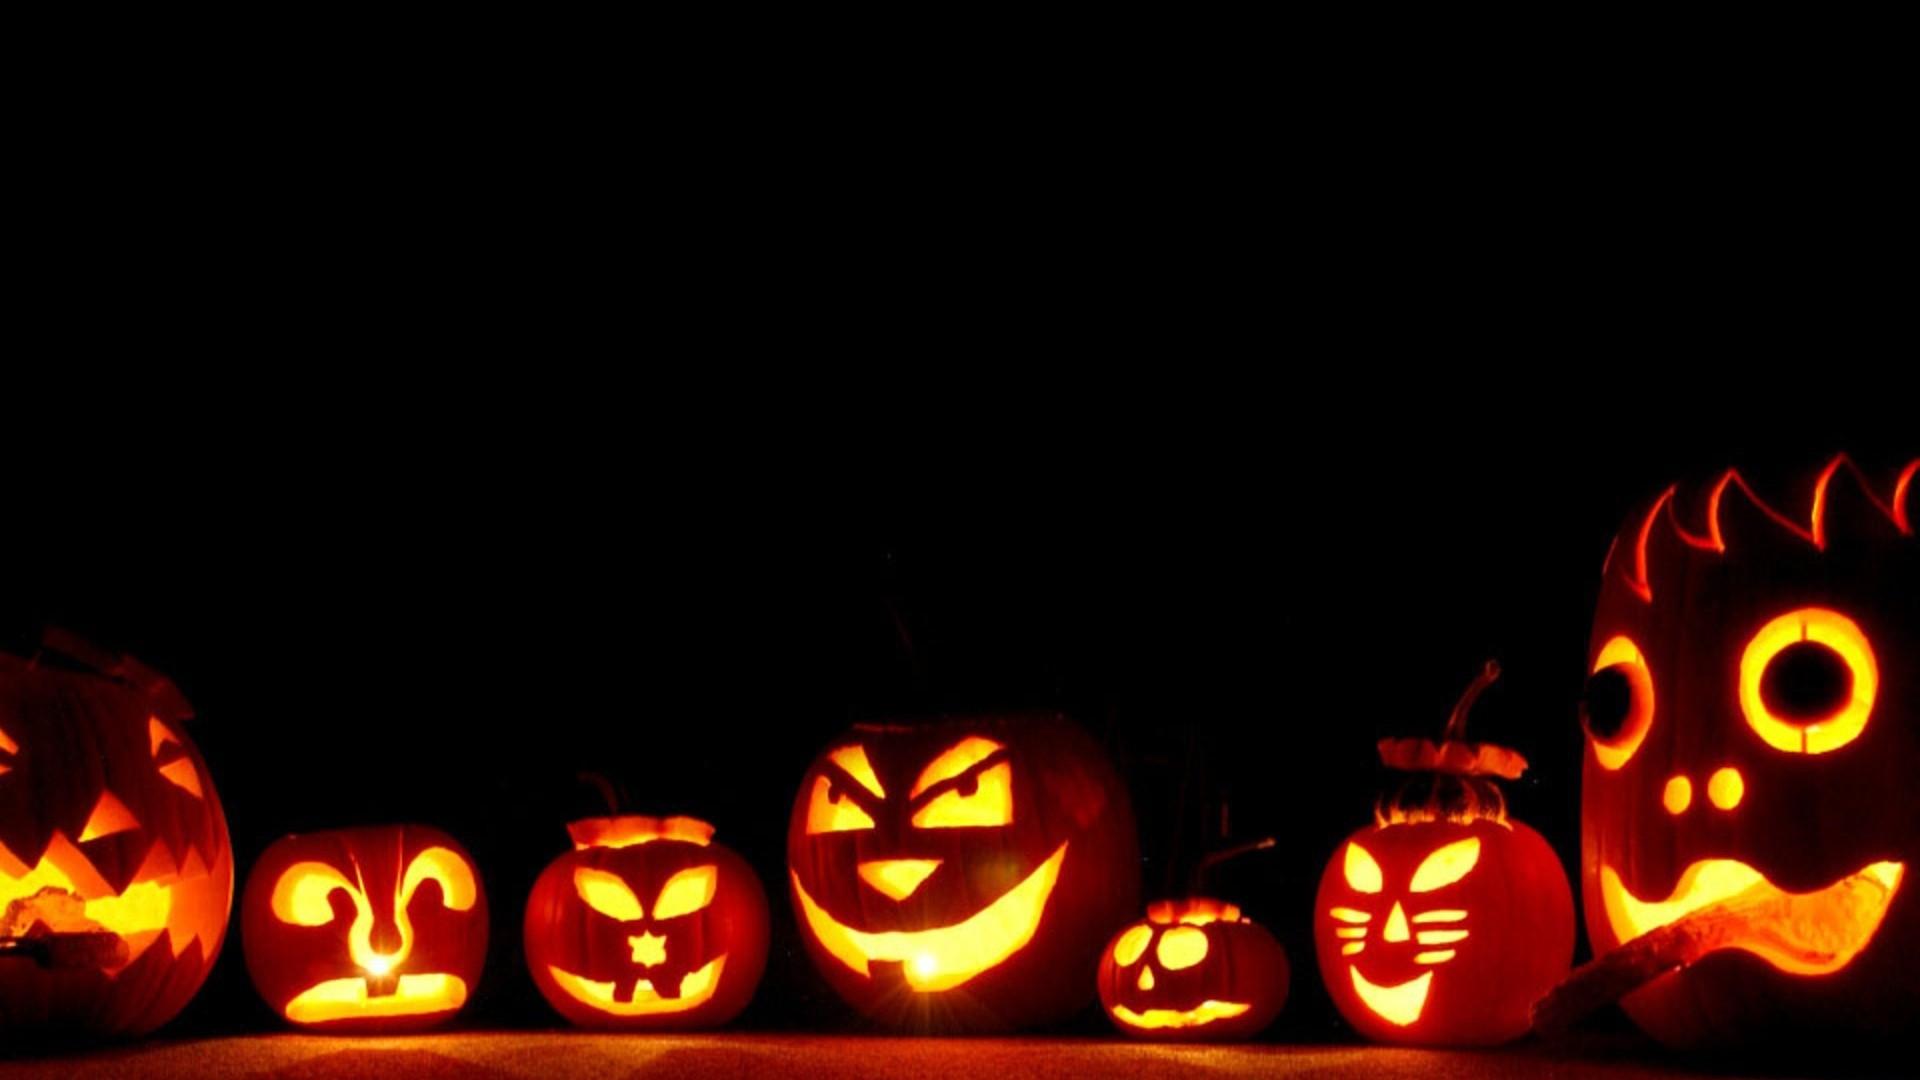 Wallpaper Halloween Pumpkin Holiday Jack O Lantern Event